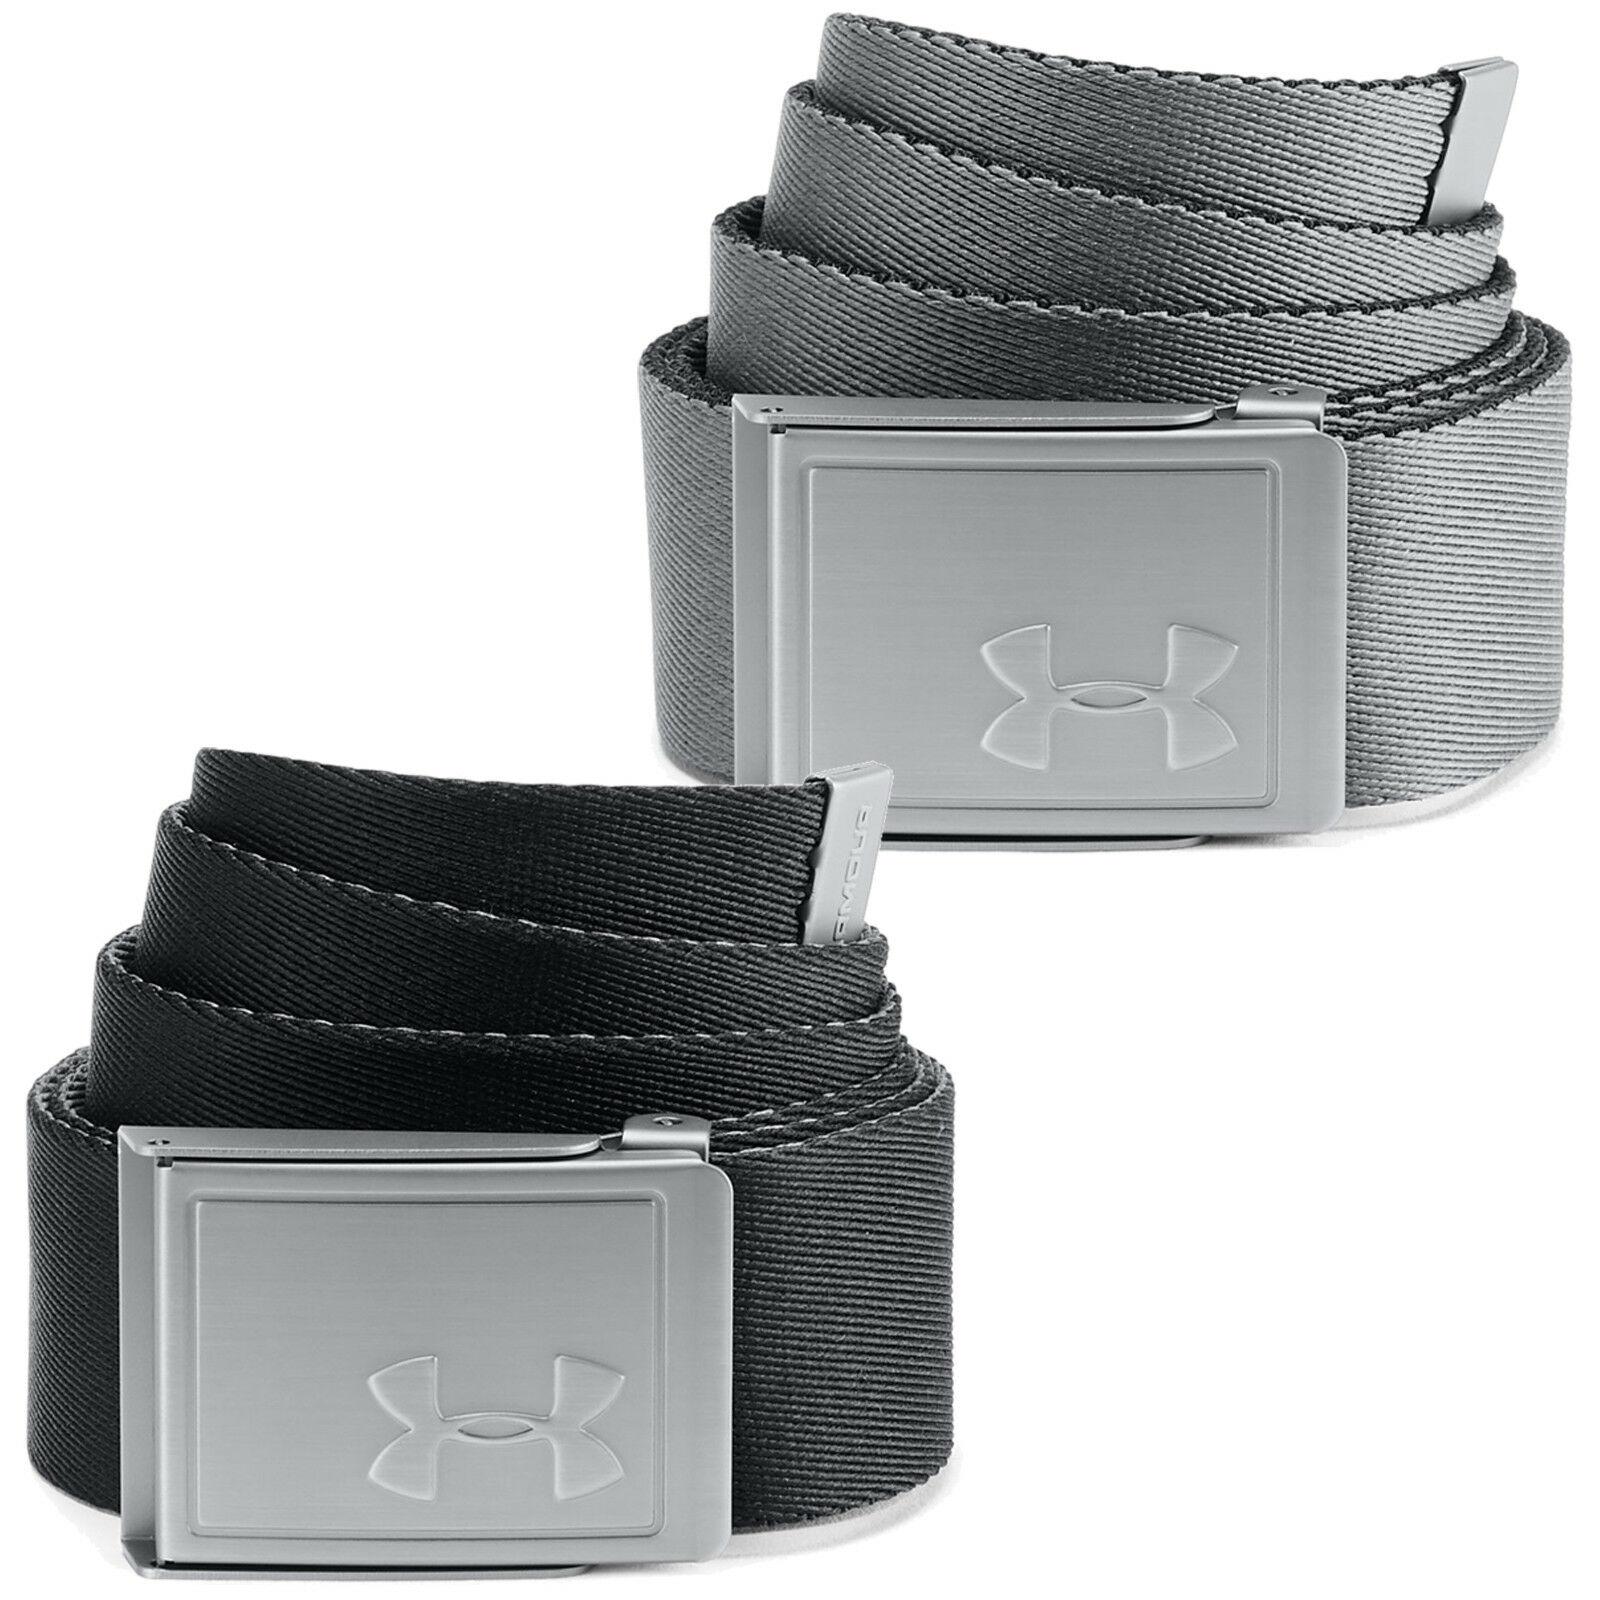 Under Armour Golf Reversible Webbing 2.0 Mens Belt  - Black/Pitch Grey